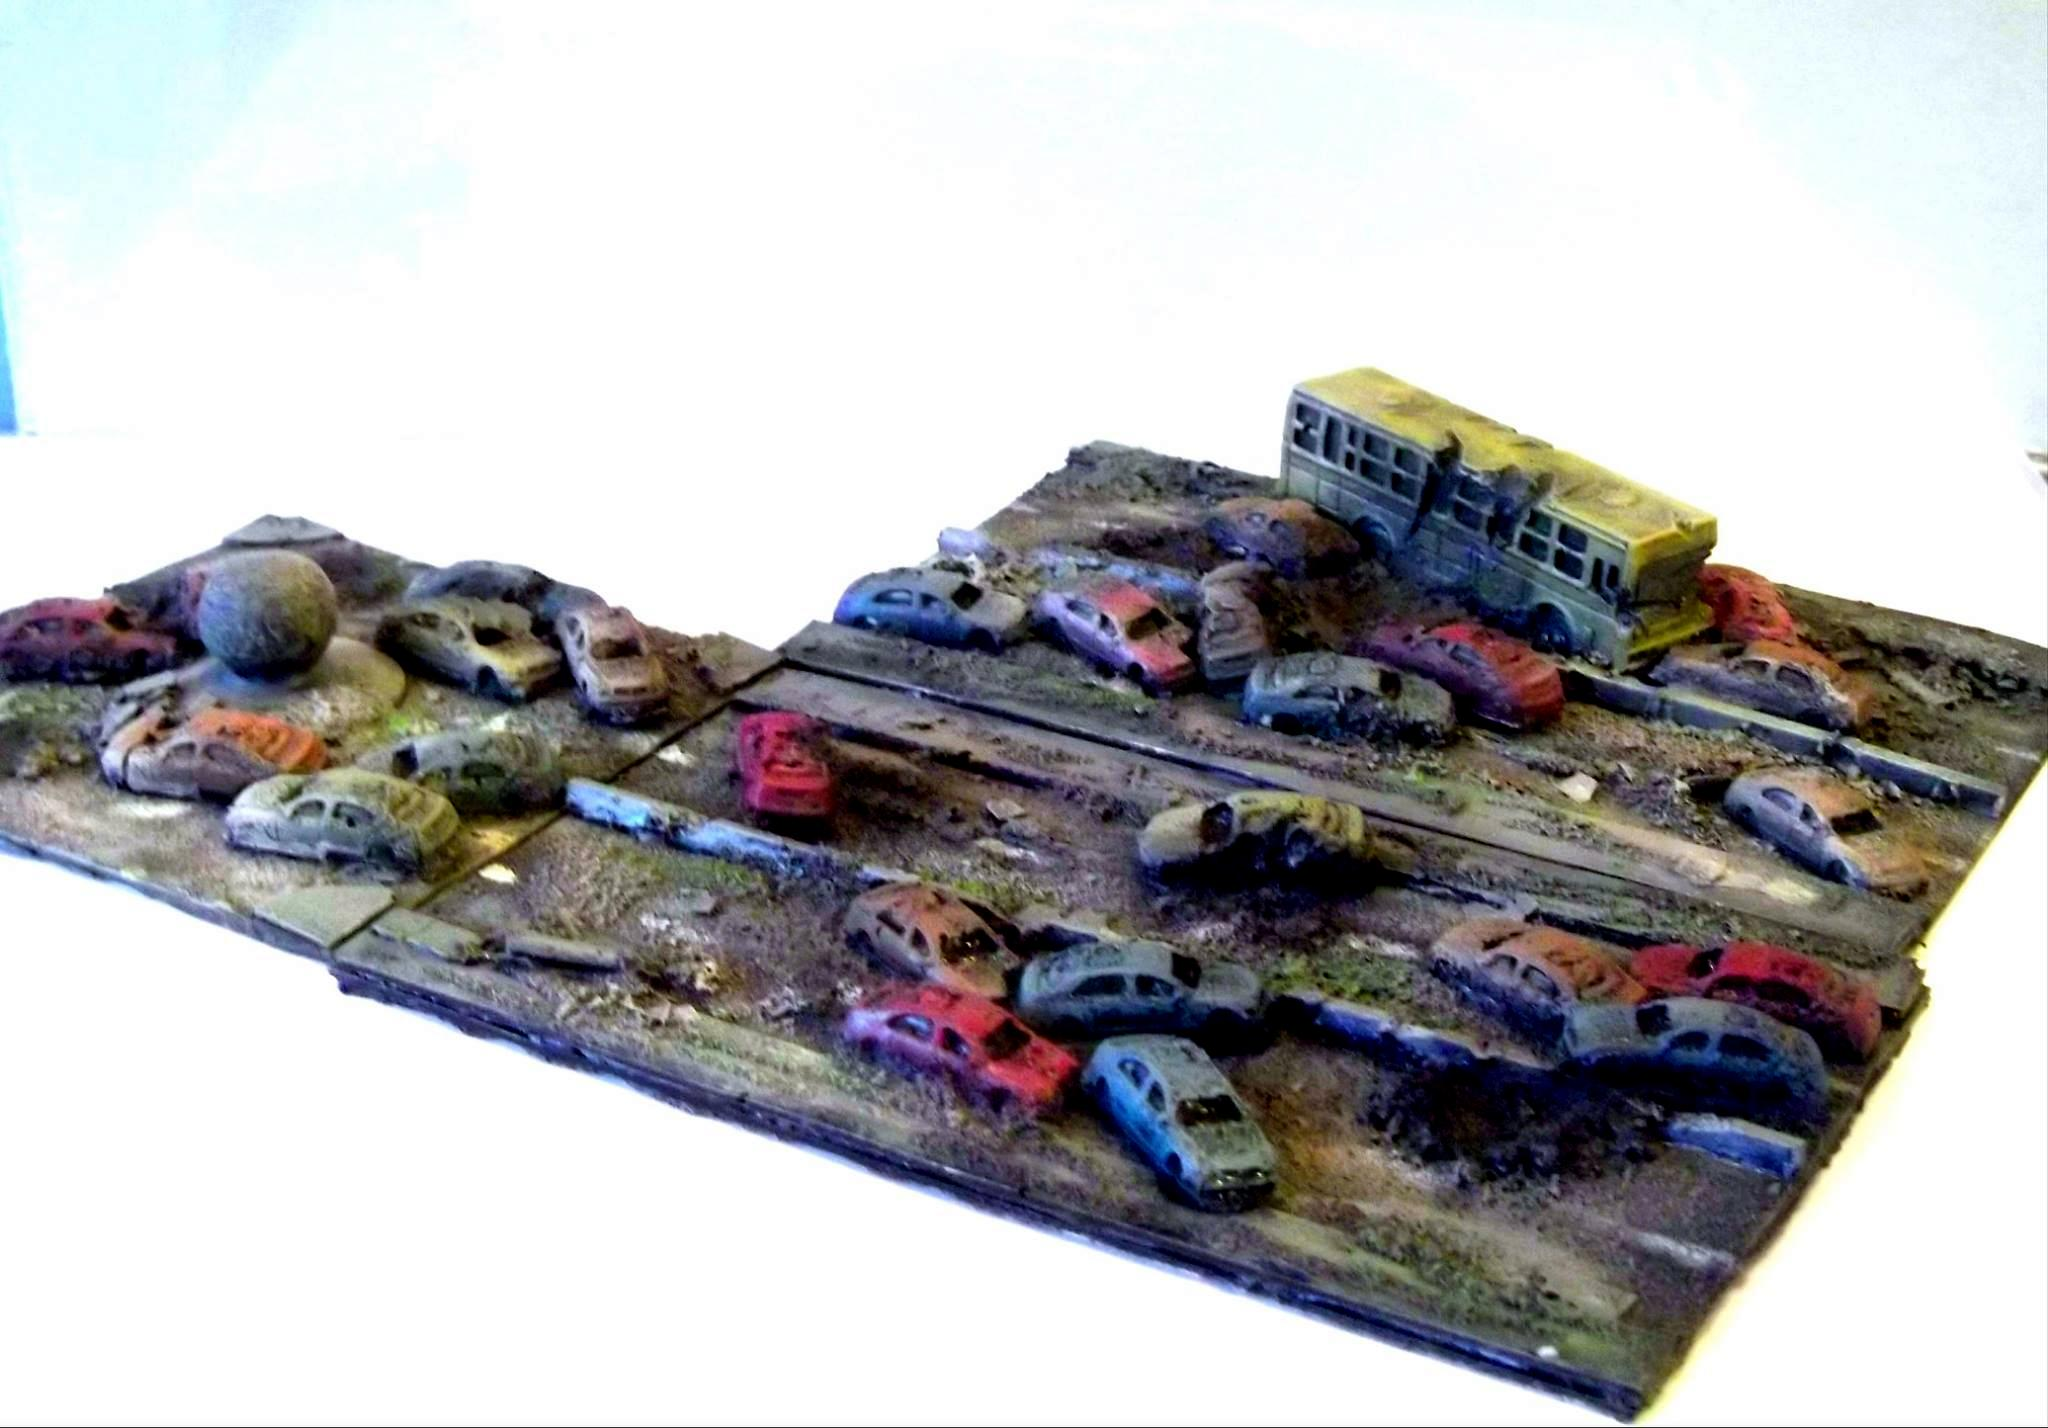 Cars, Dropzone, Dropzone Modular Road, Modular Road, Road, Terrain